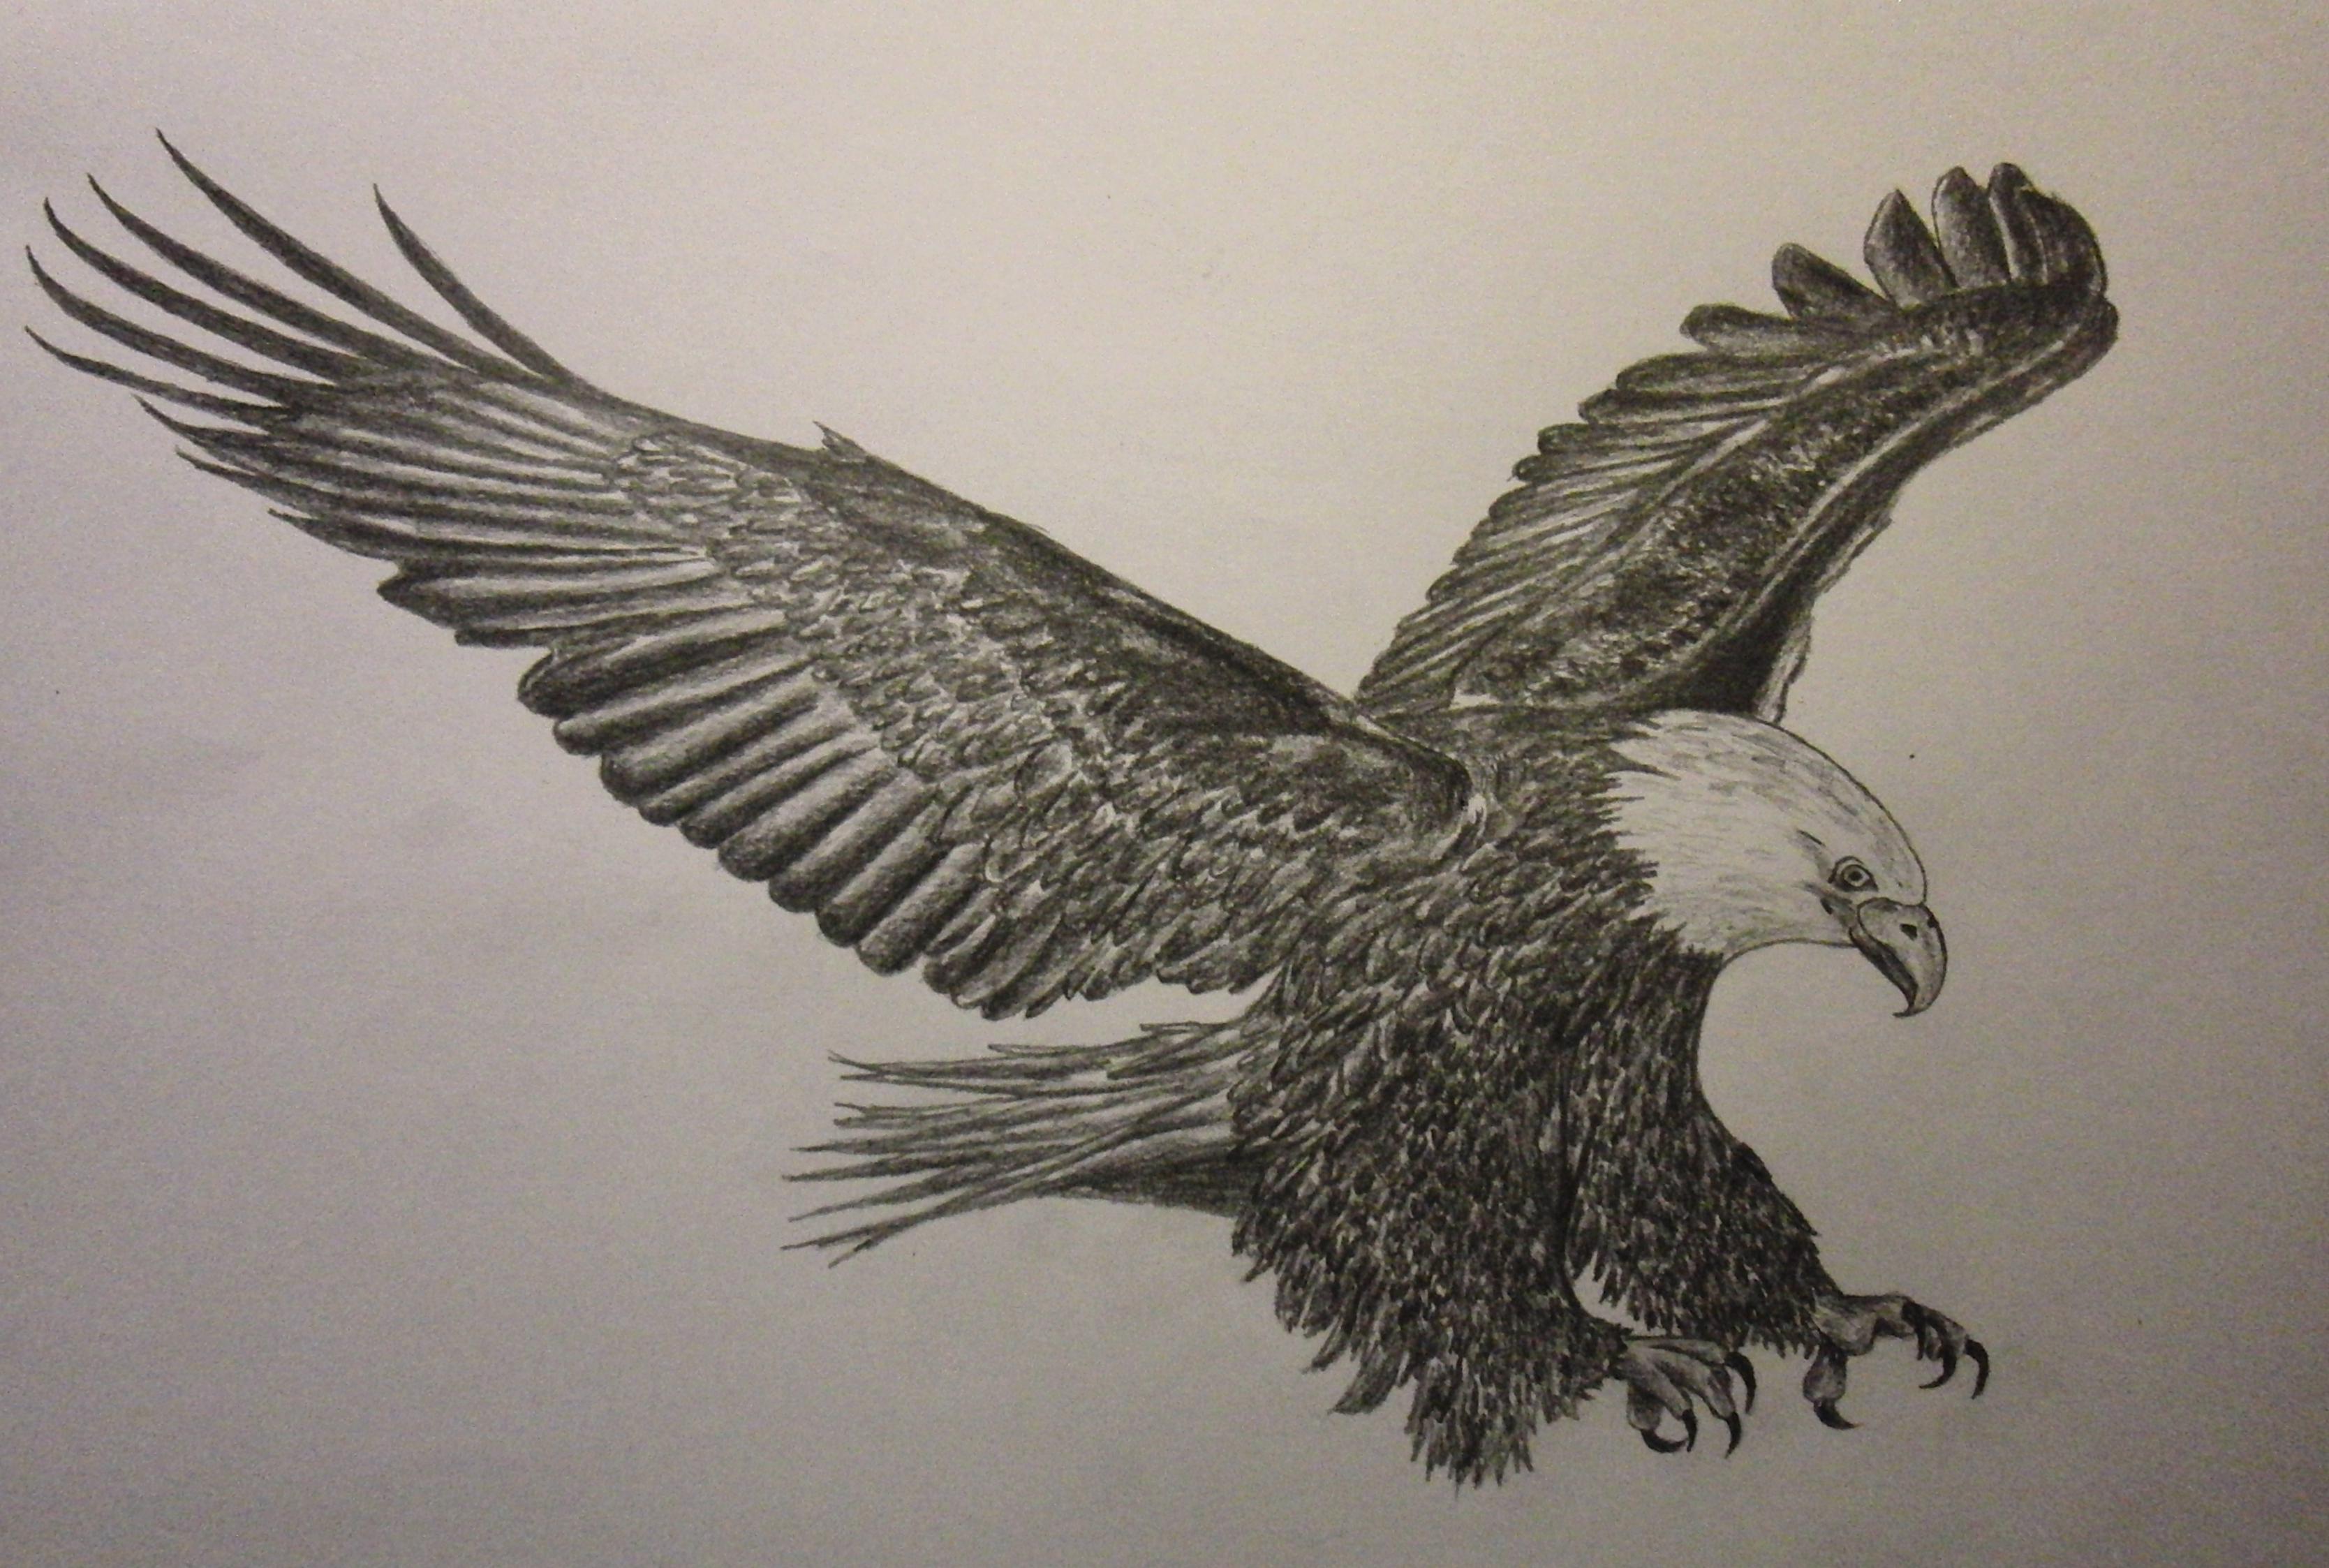 3336x2246 Eagle Flying Pencil Sketch Eagle Flying Pencil Sketch Flying Eagle